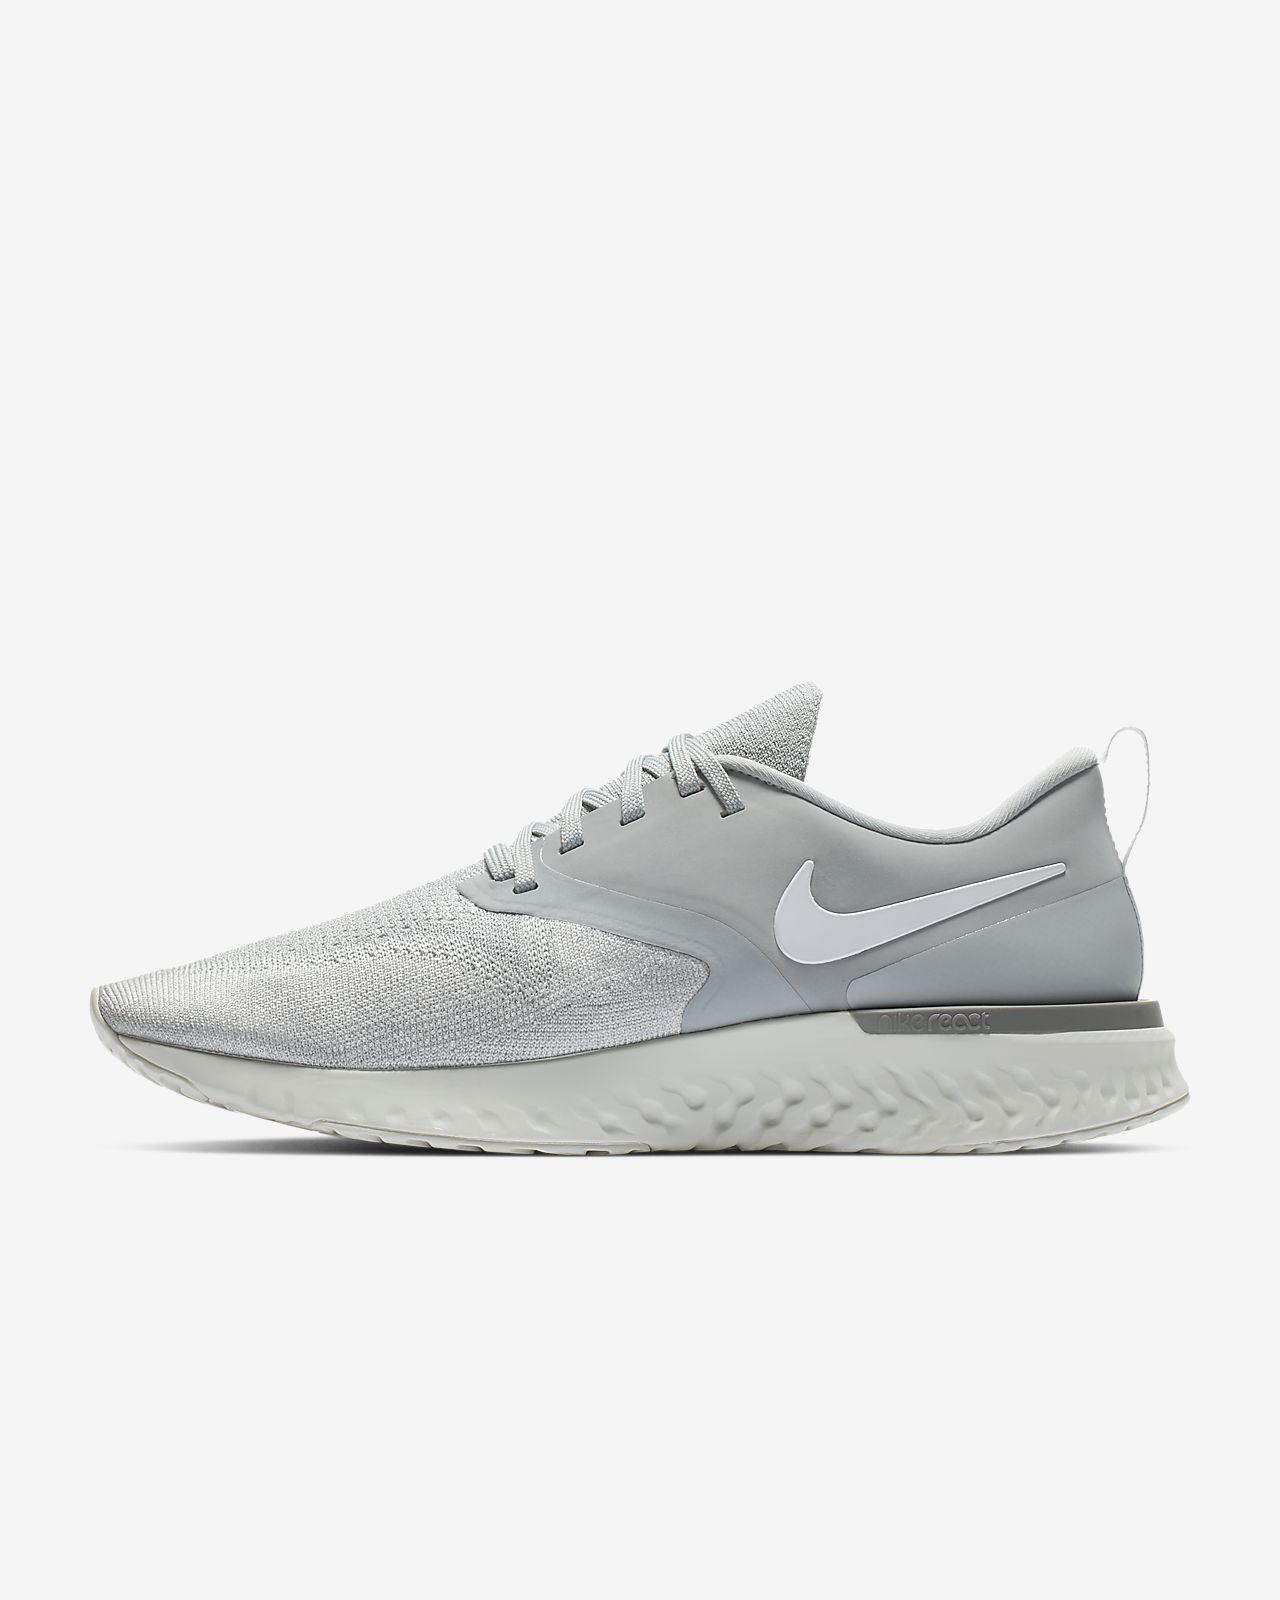 Flyknit Shoe Nike Odyssey 2 Running React Men's XukZOPi